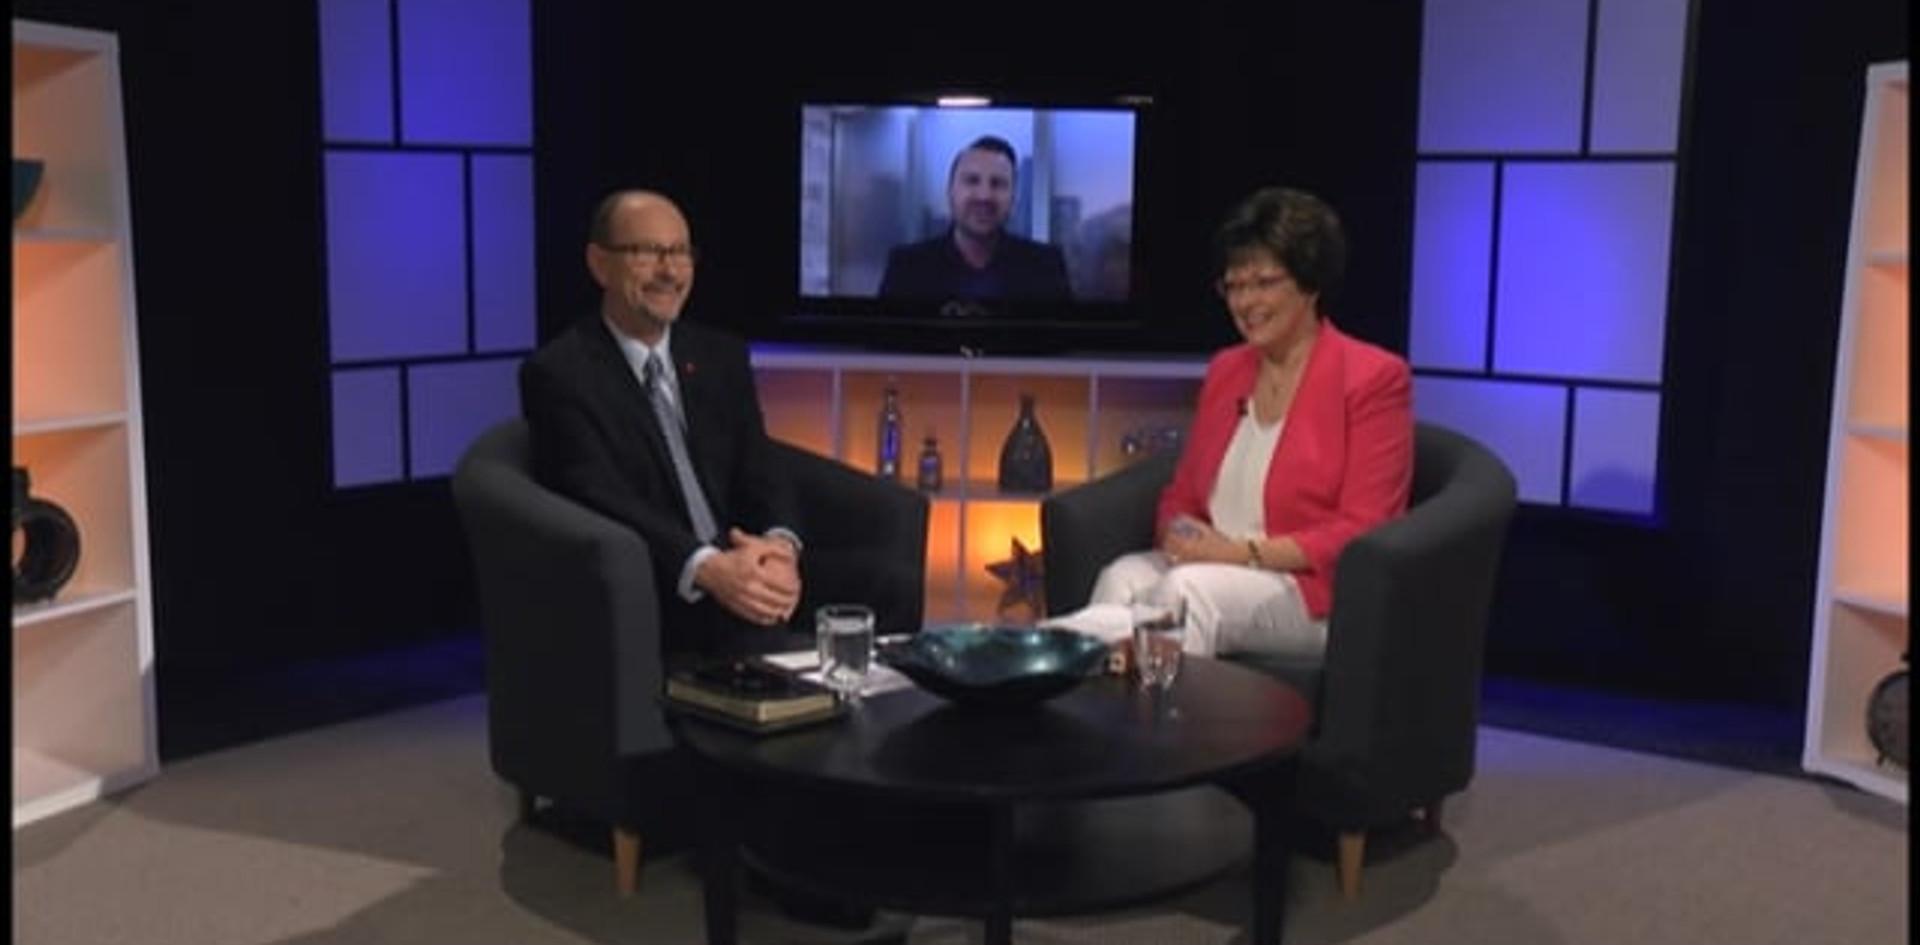 LIFELINE TODAY | Season 3, Episode 94 | Joël Spinks, Len Zoeteman